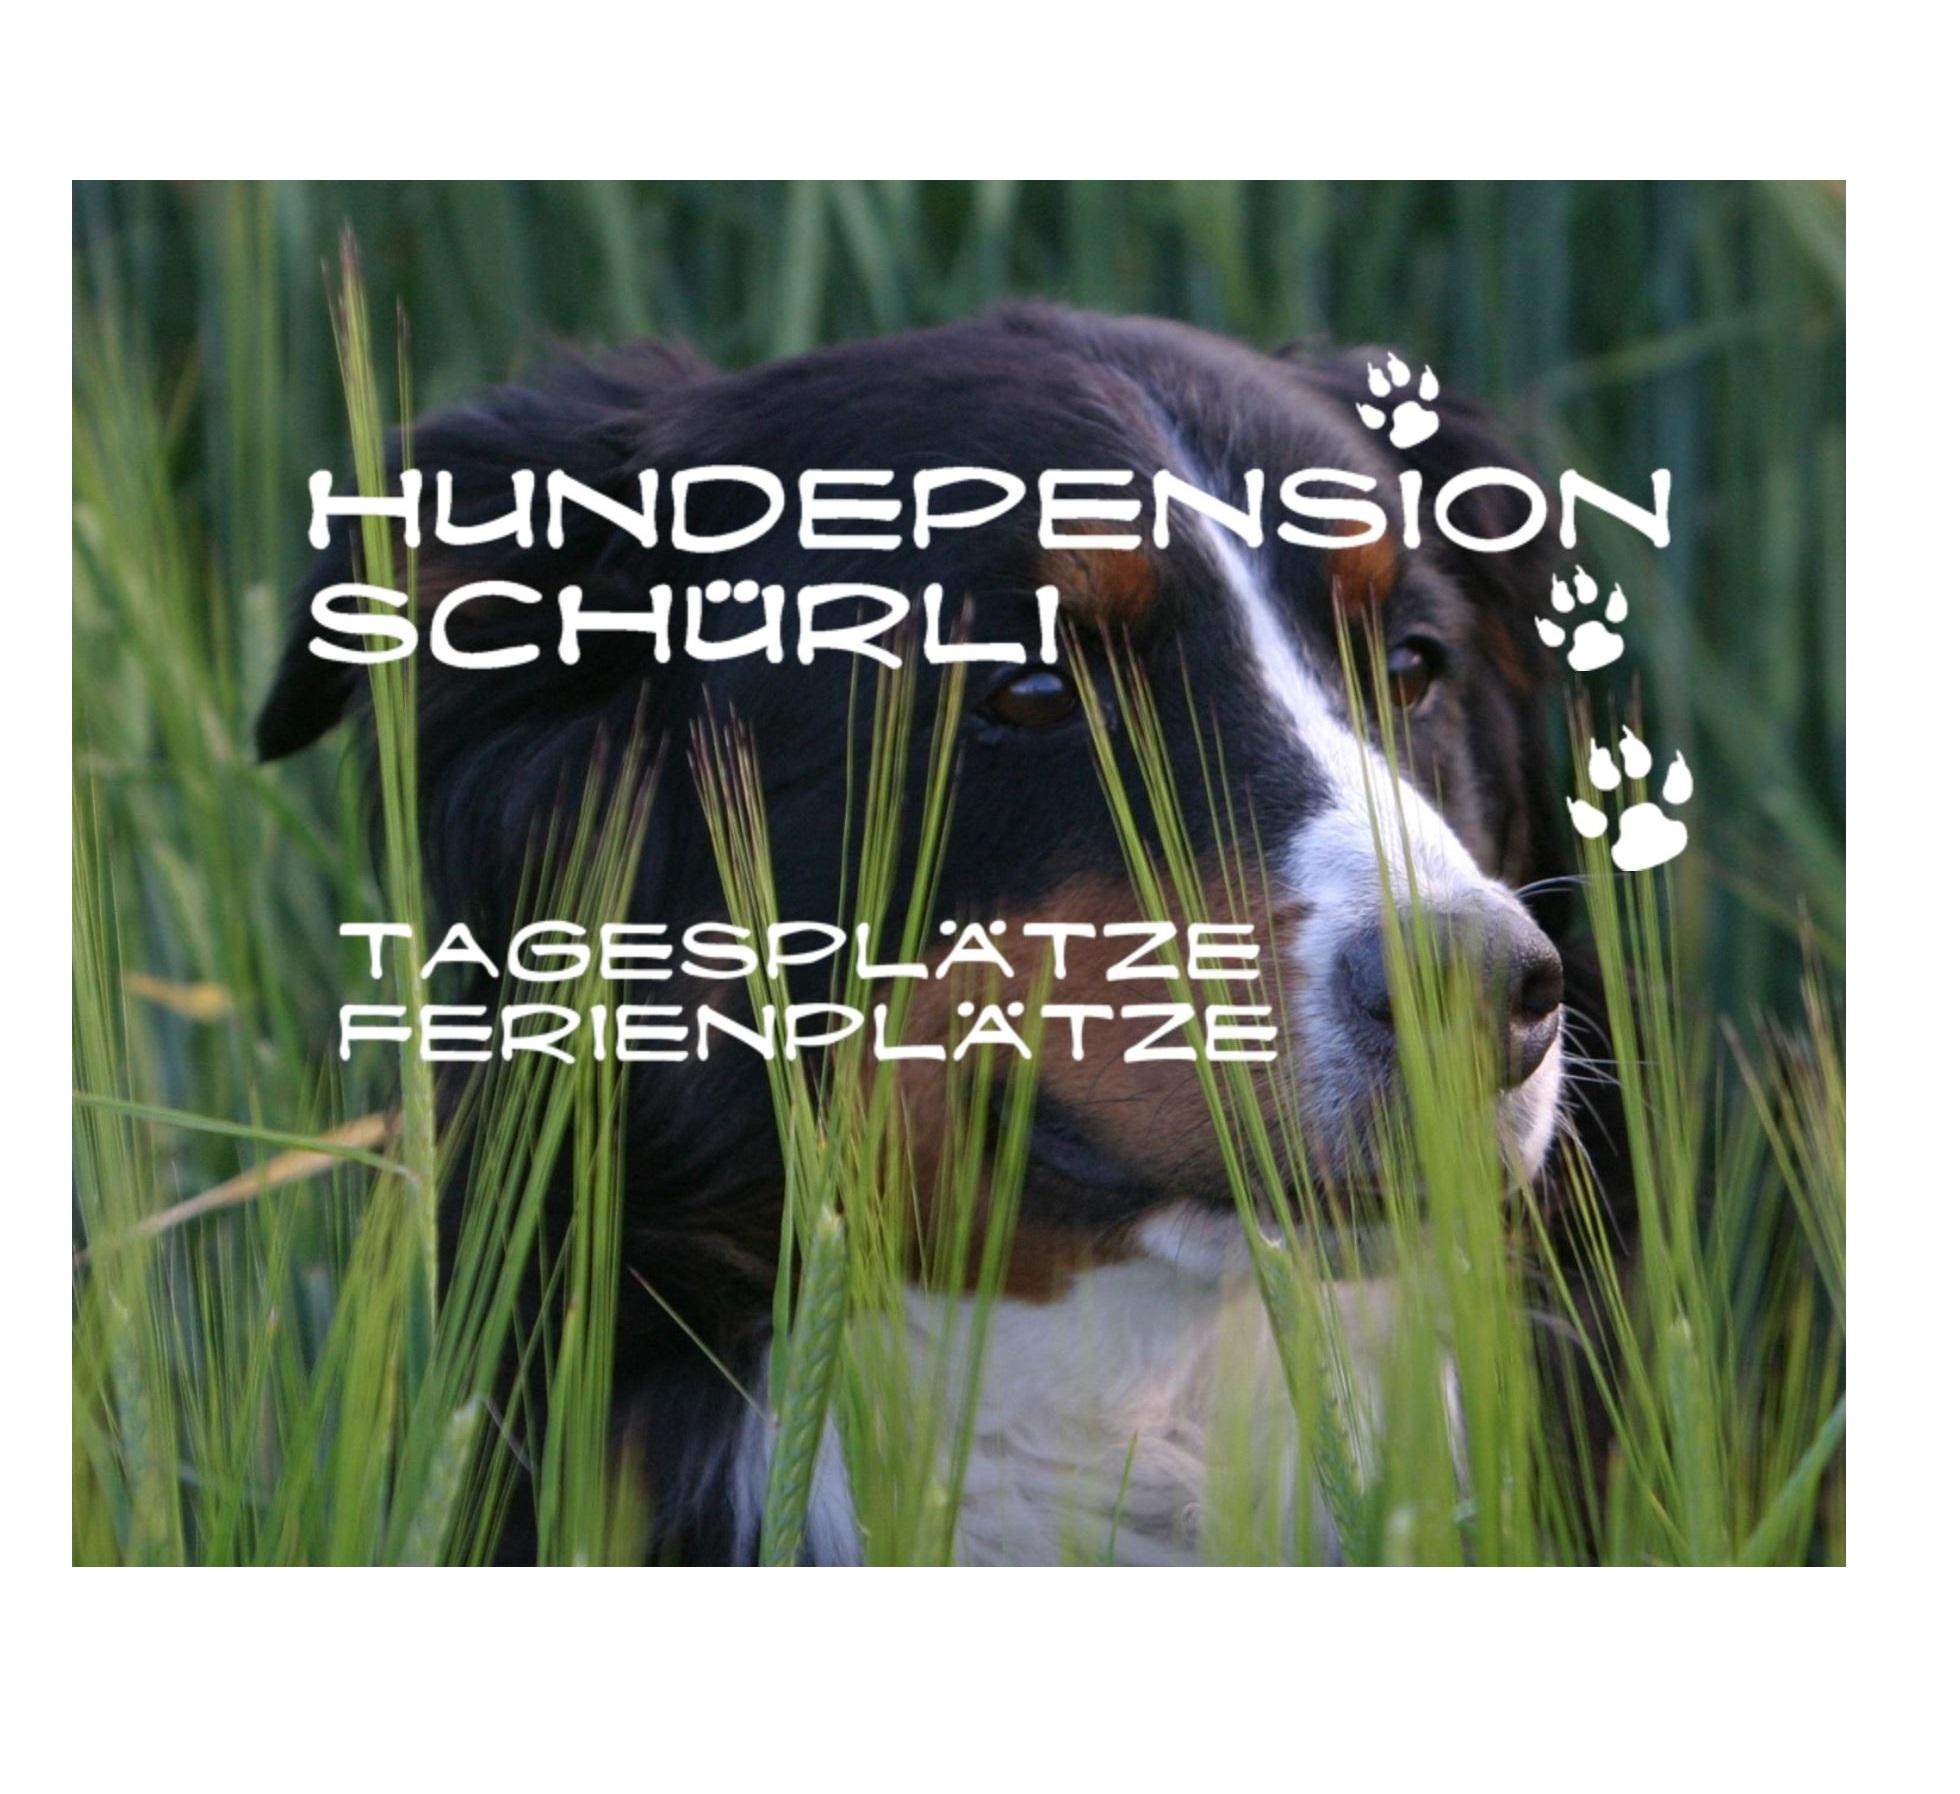 Hundepension_Schürli